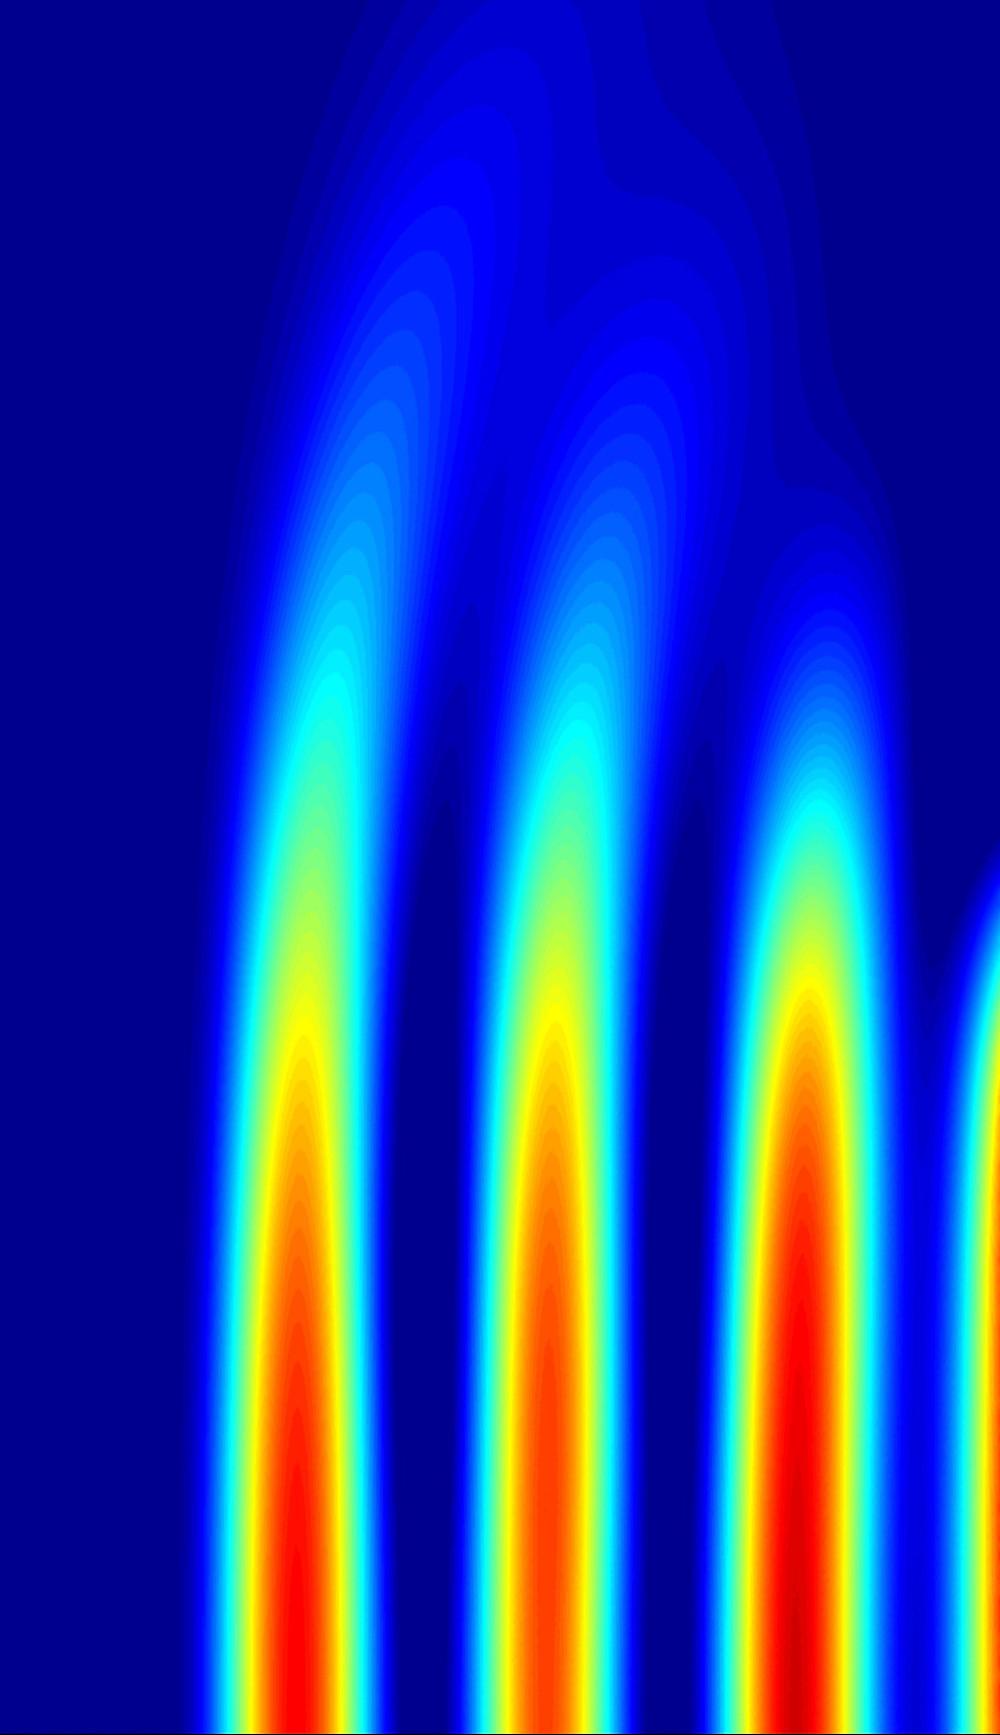 Propagation of the terahertz waves in ionized gas in a magnetic field of 178 tesla. Copyright: Forschungszentrum Jülich